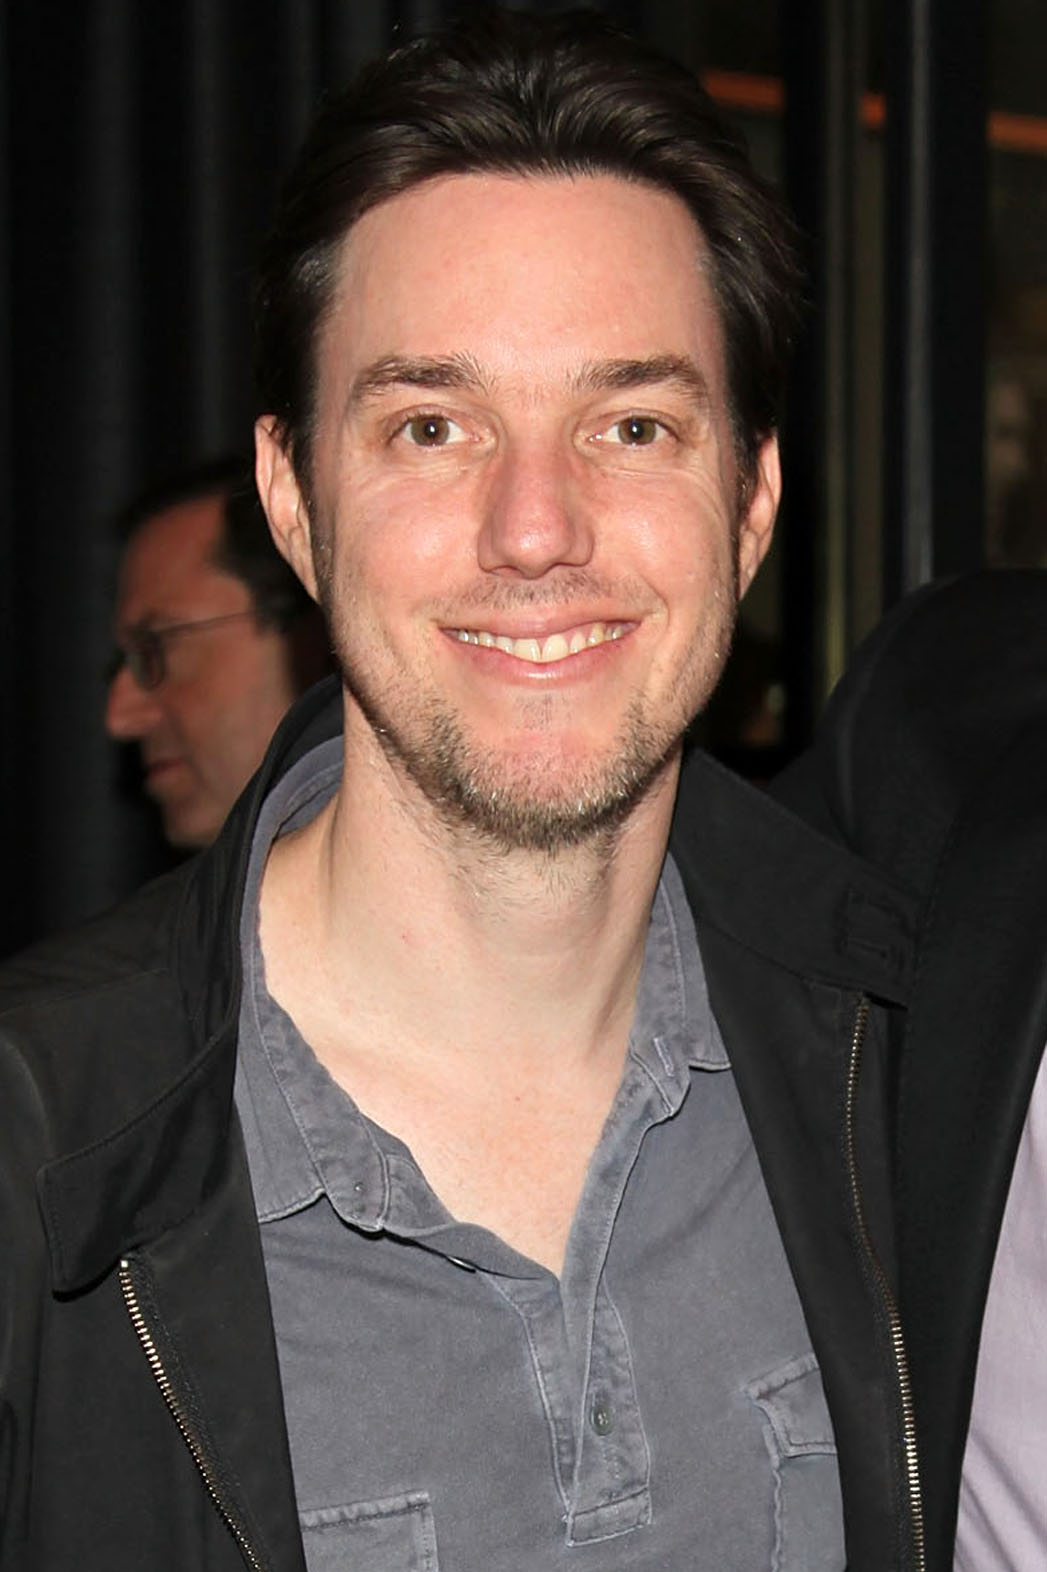 Dylan Leiner Headshot - P 2014